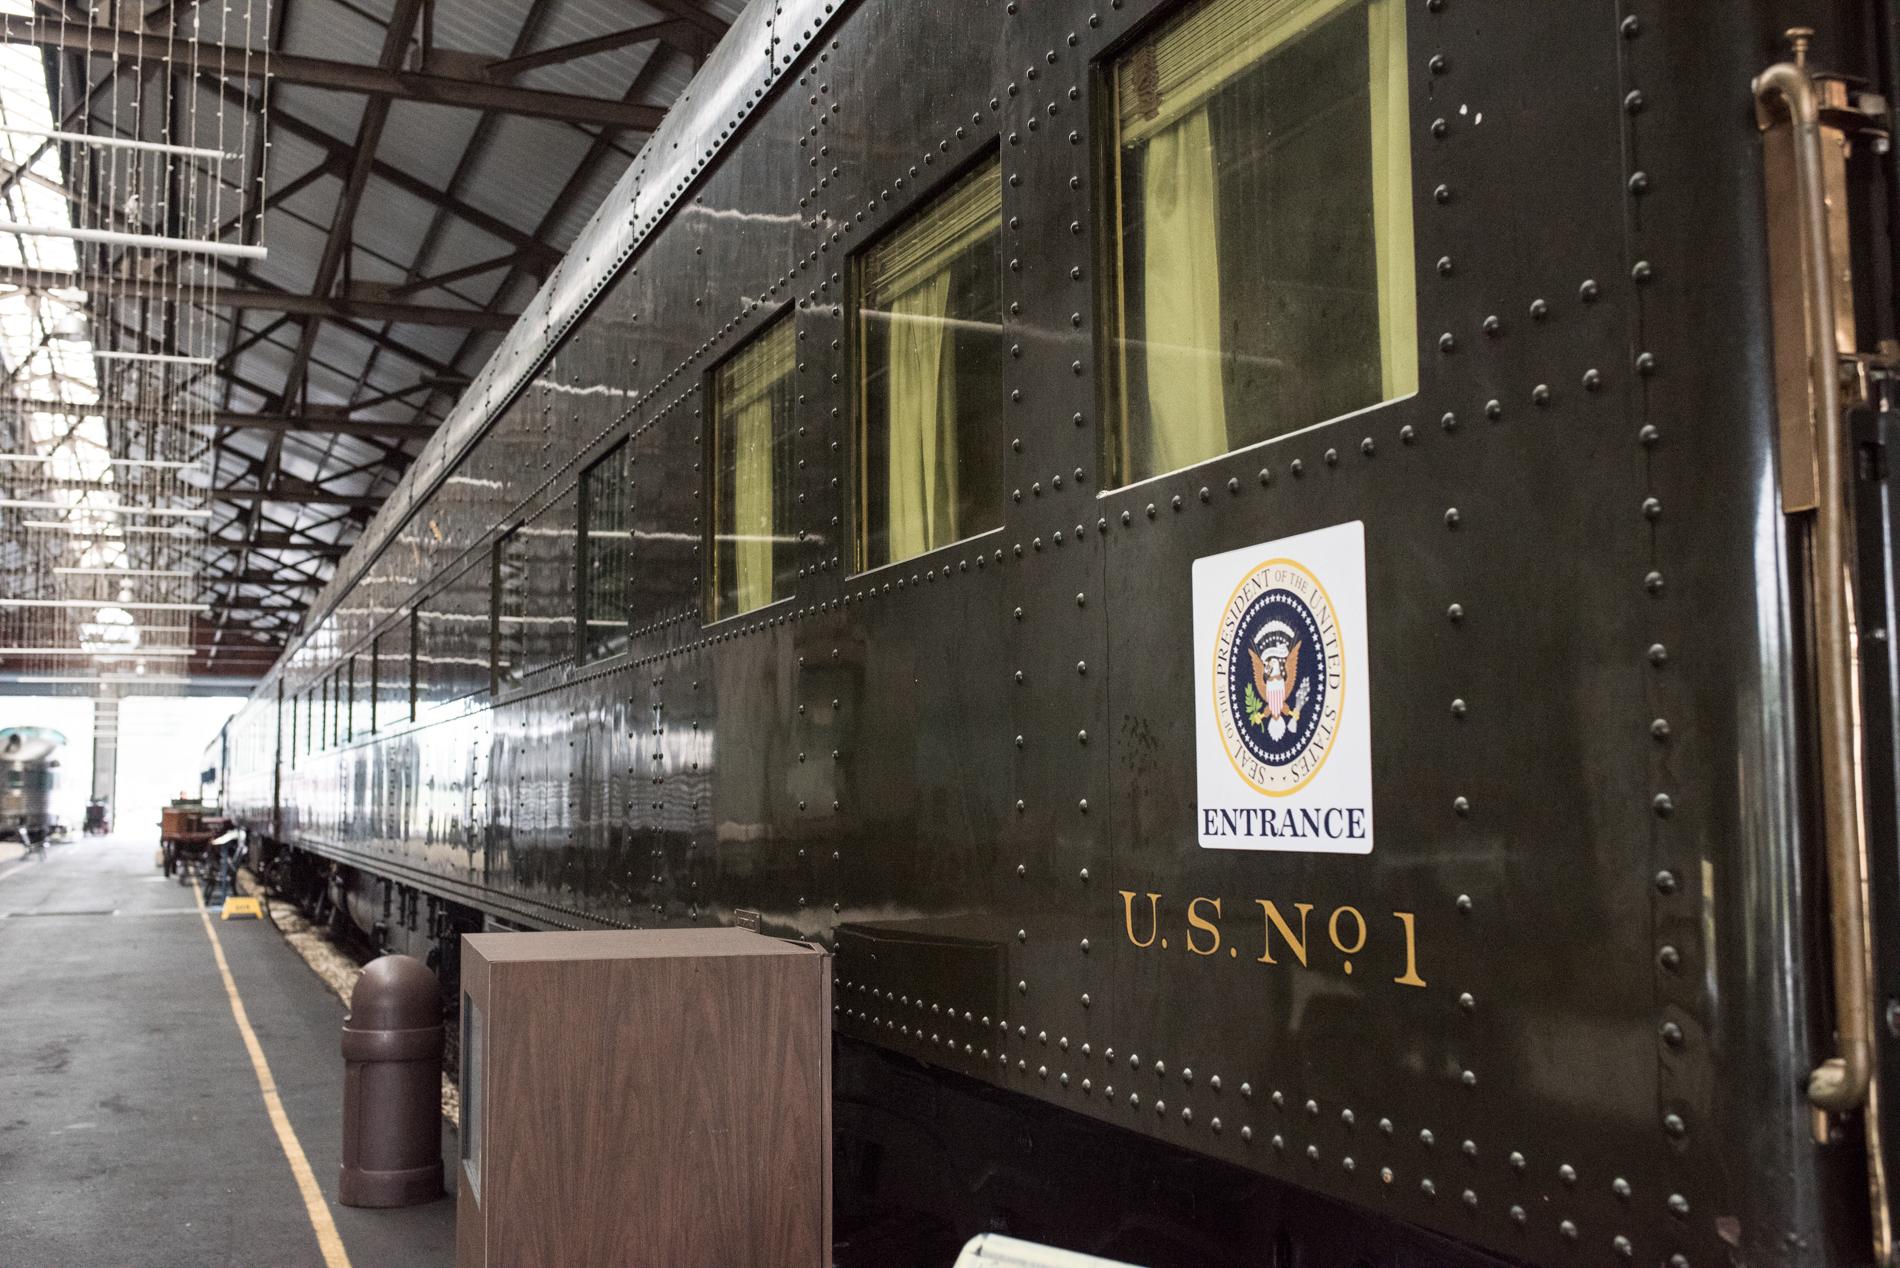 Presidential Railcar